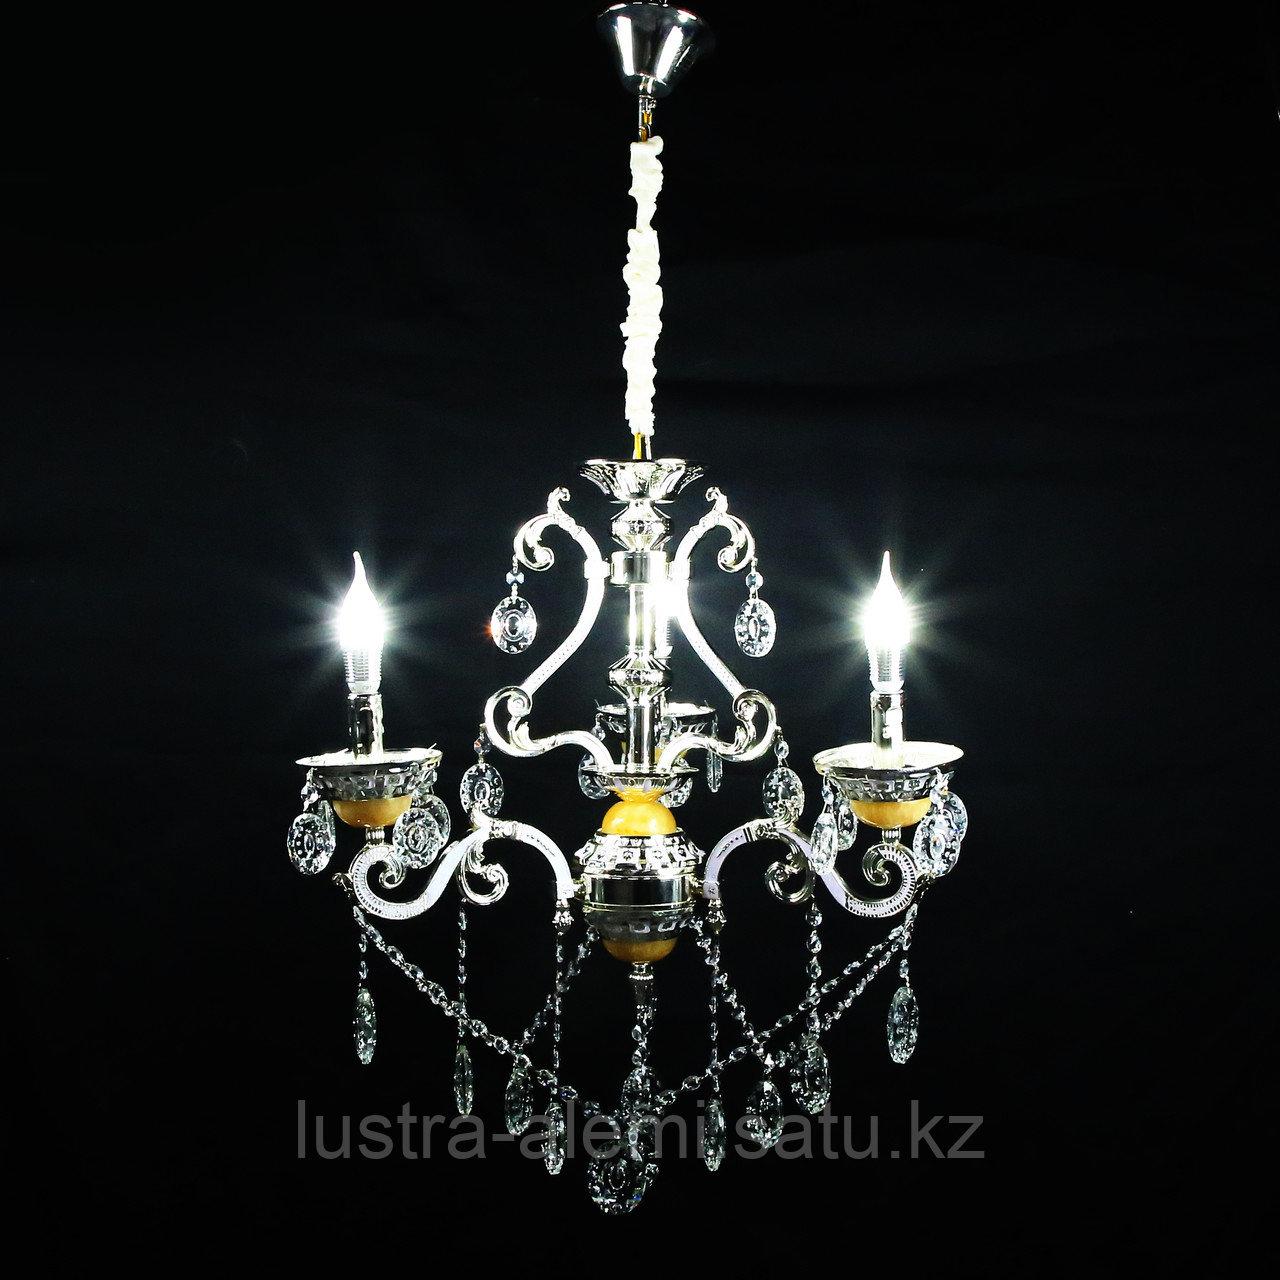 Люстра Классика 8825/3 Silver